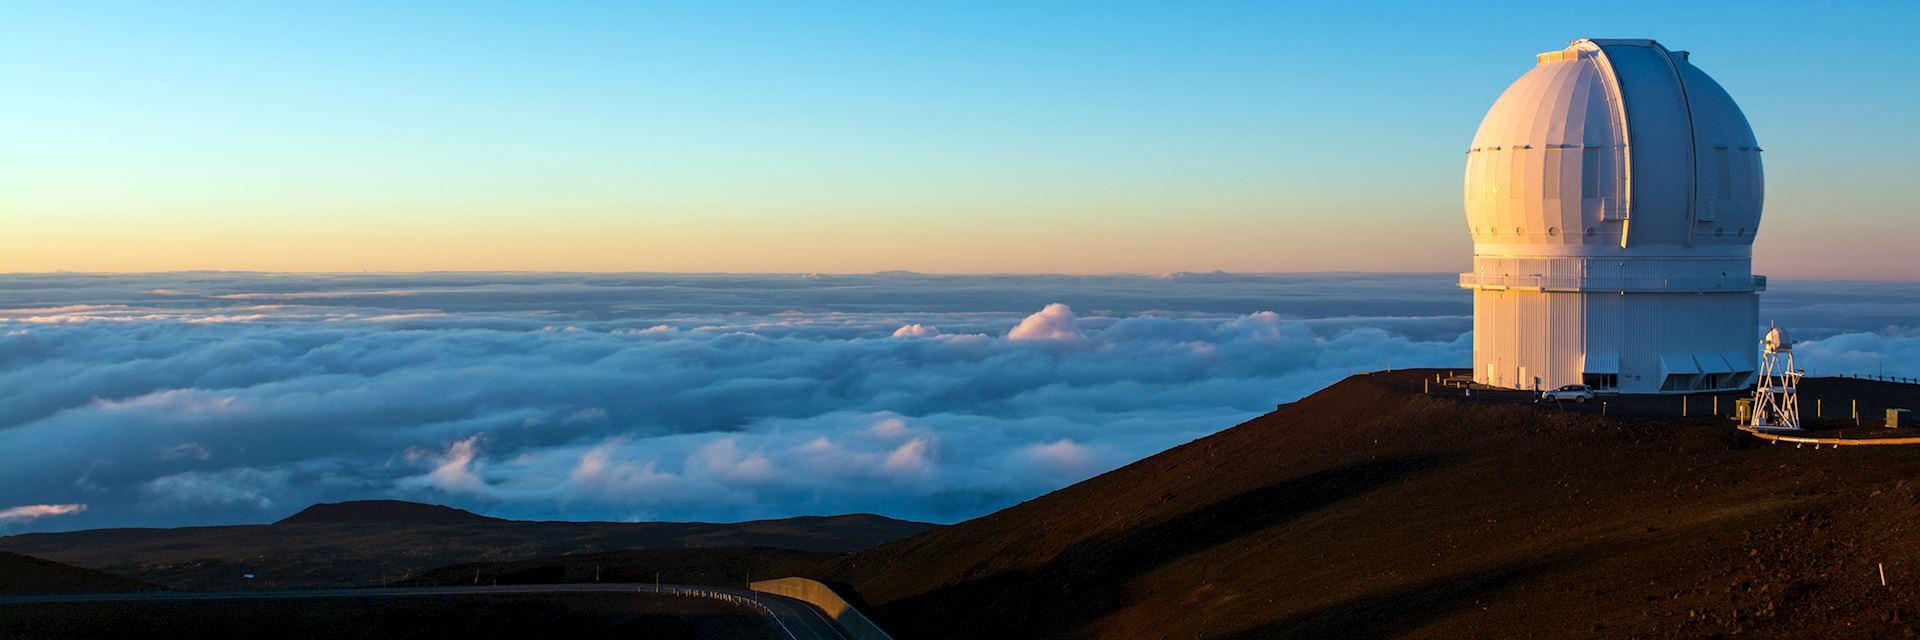 Mauna Kea Observatory, Hawaii